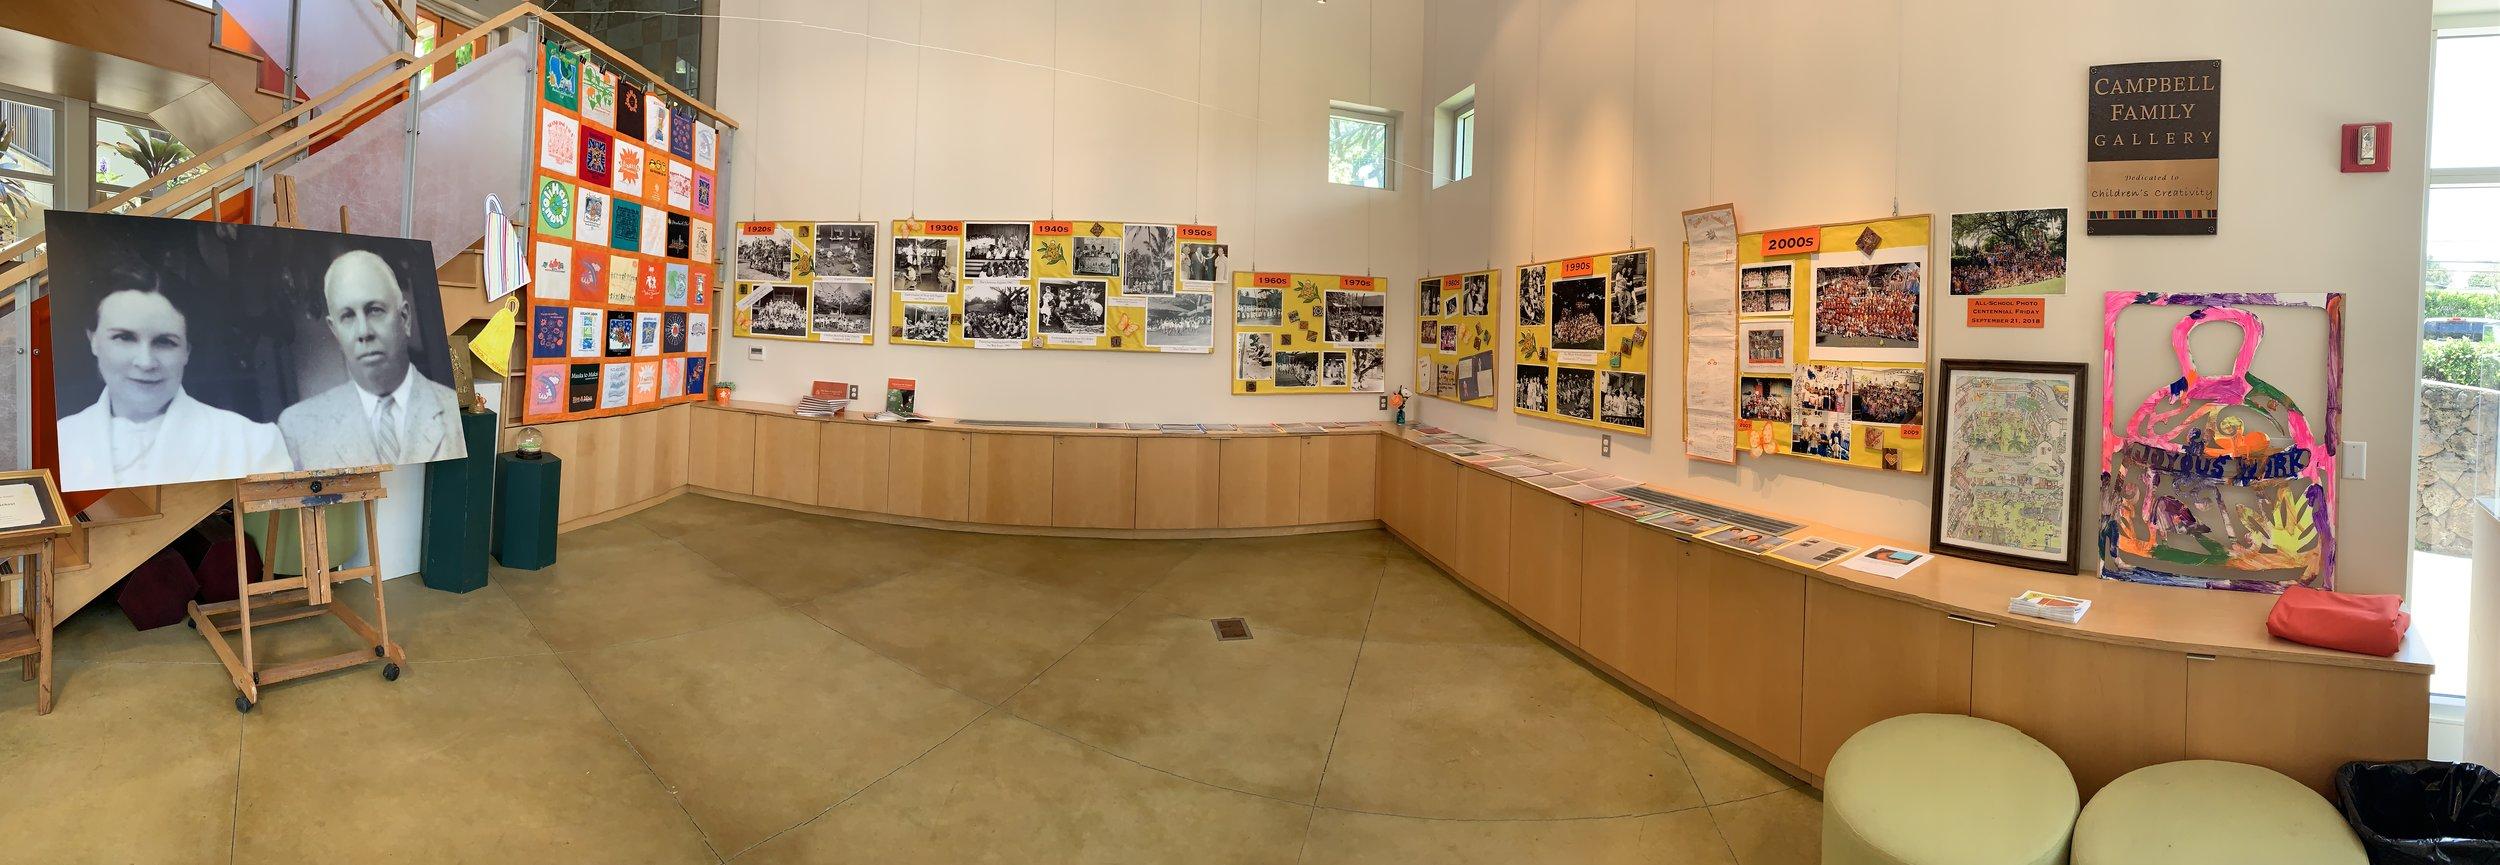 2019 Hanahauoli Alumni Day Gallery Display.jpg